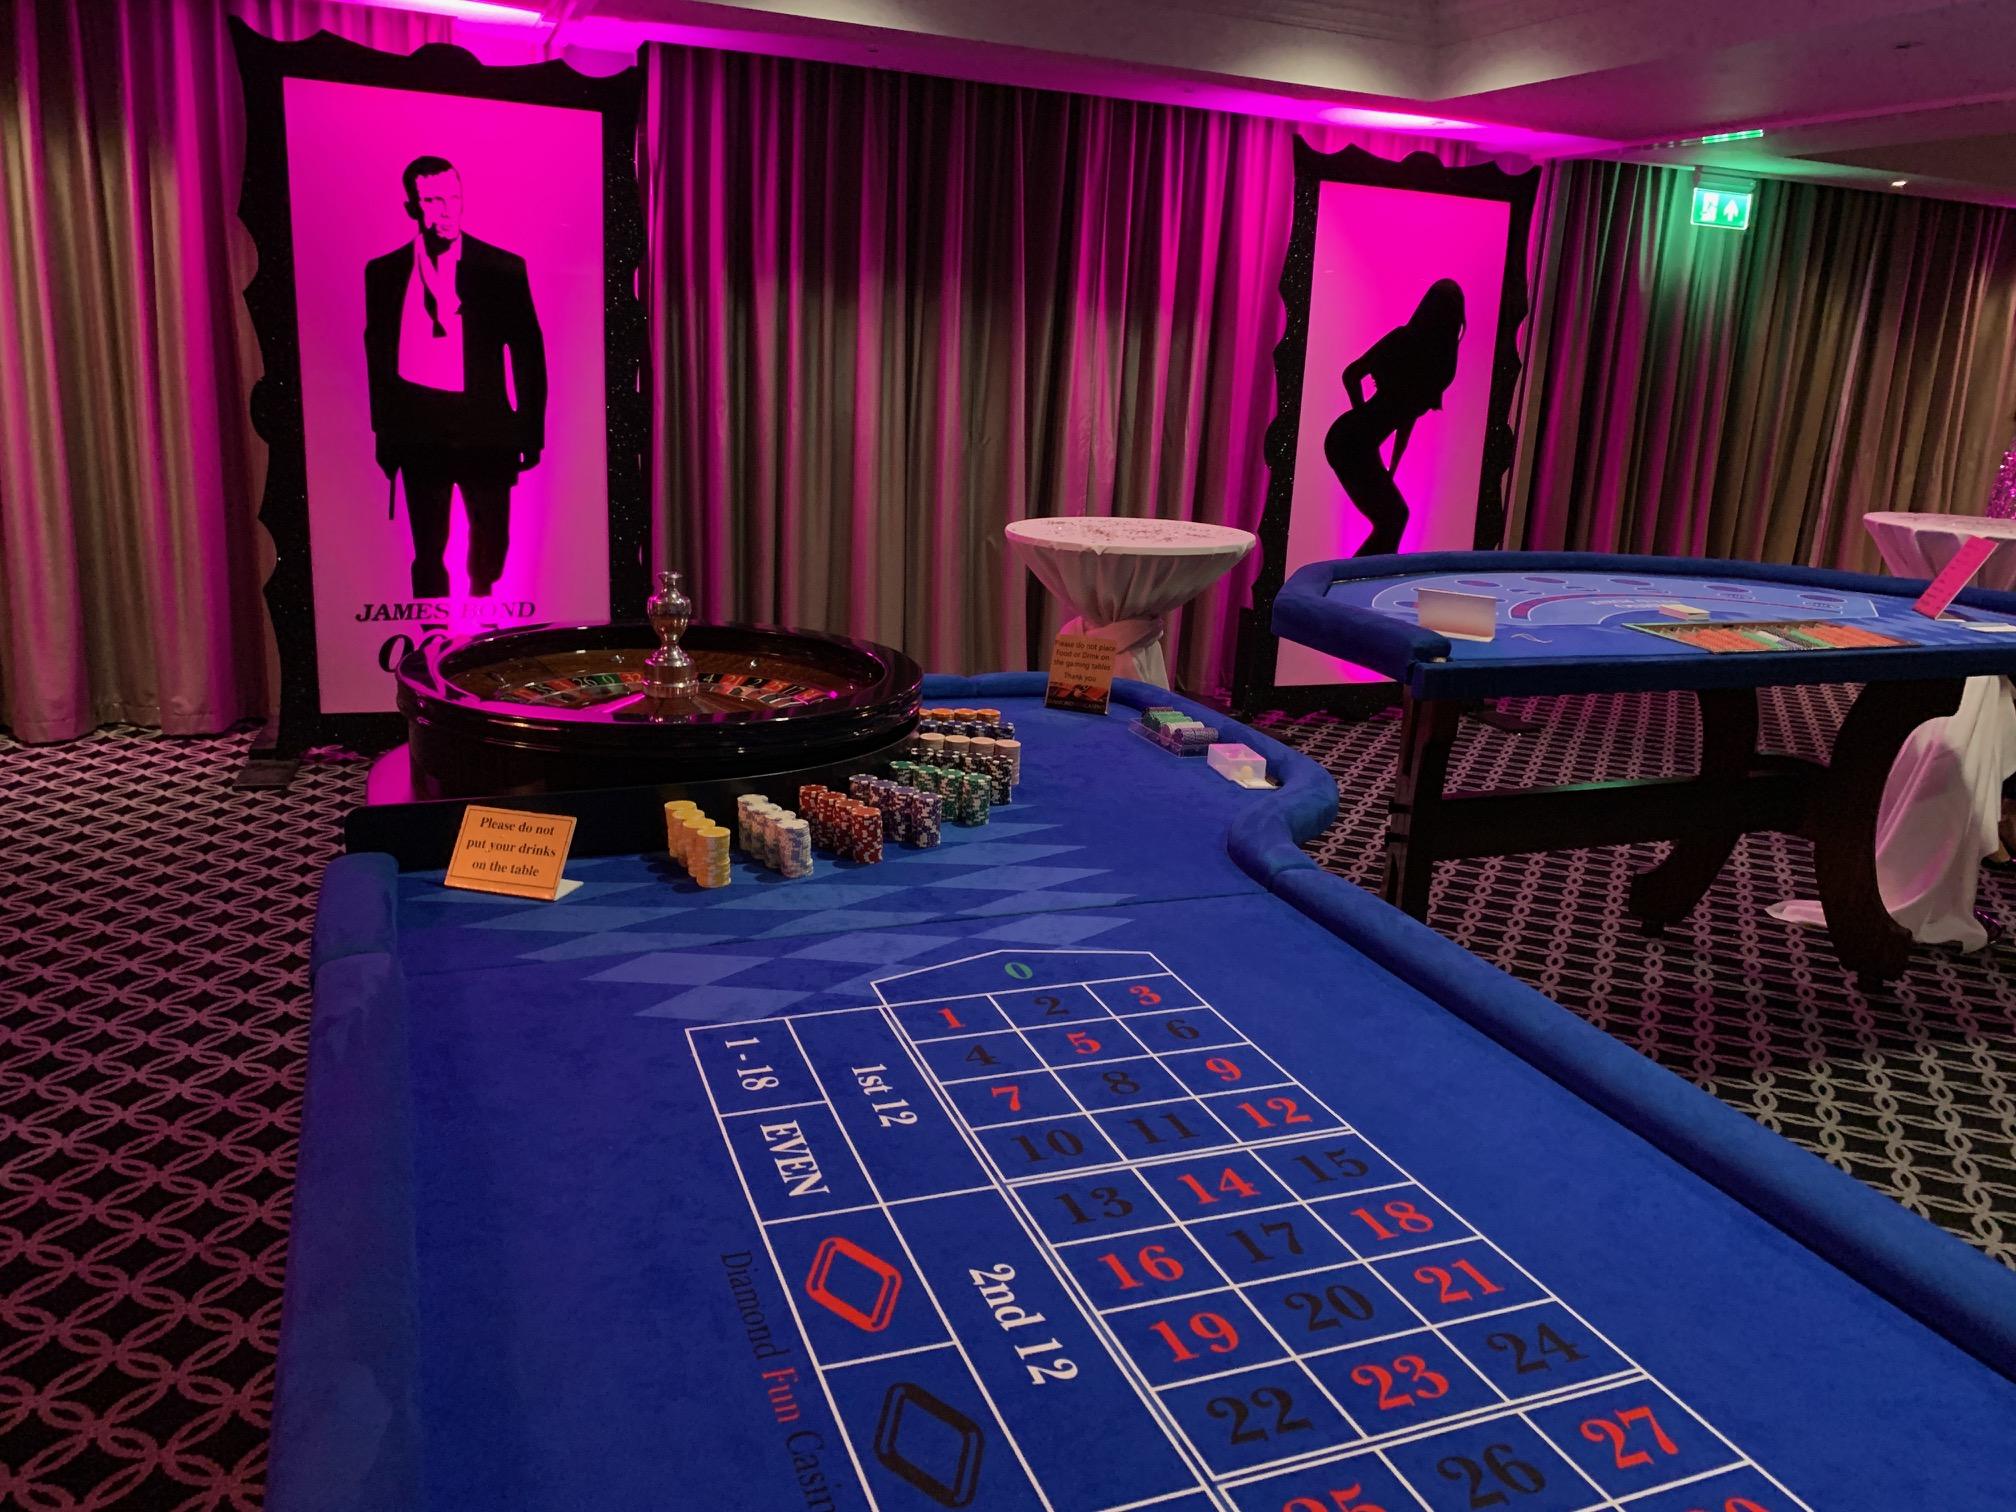 Cambridge mobile casino jennings silver dollar slot machine